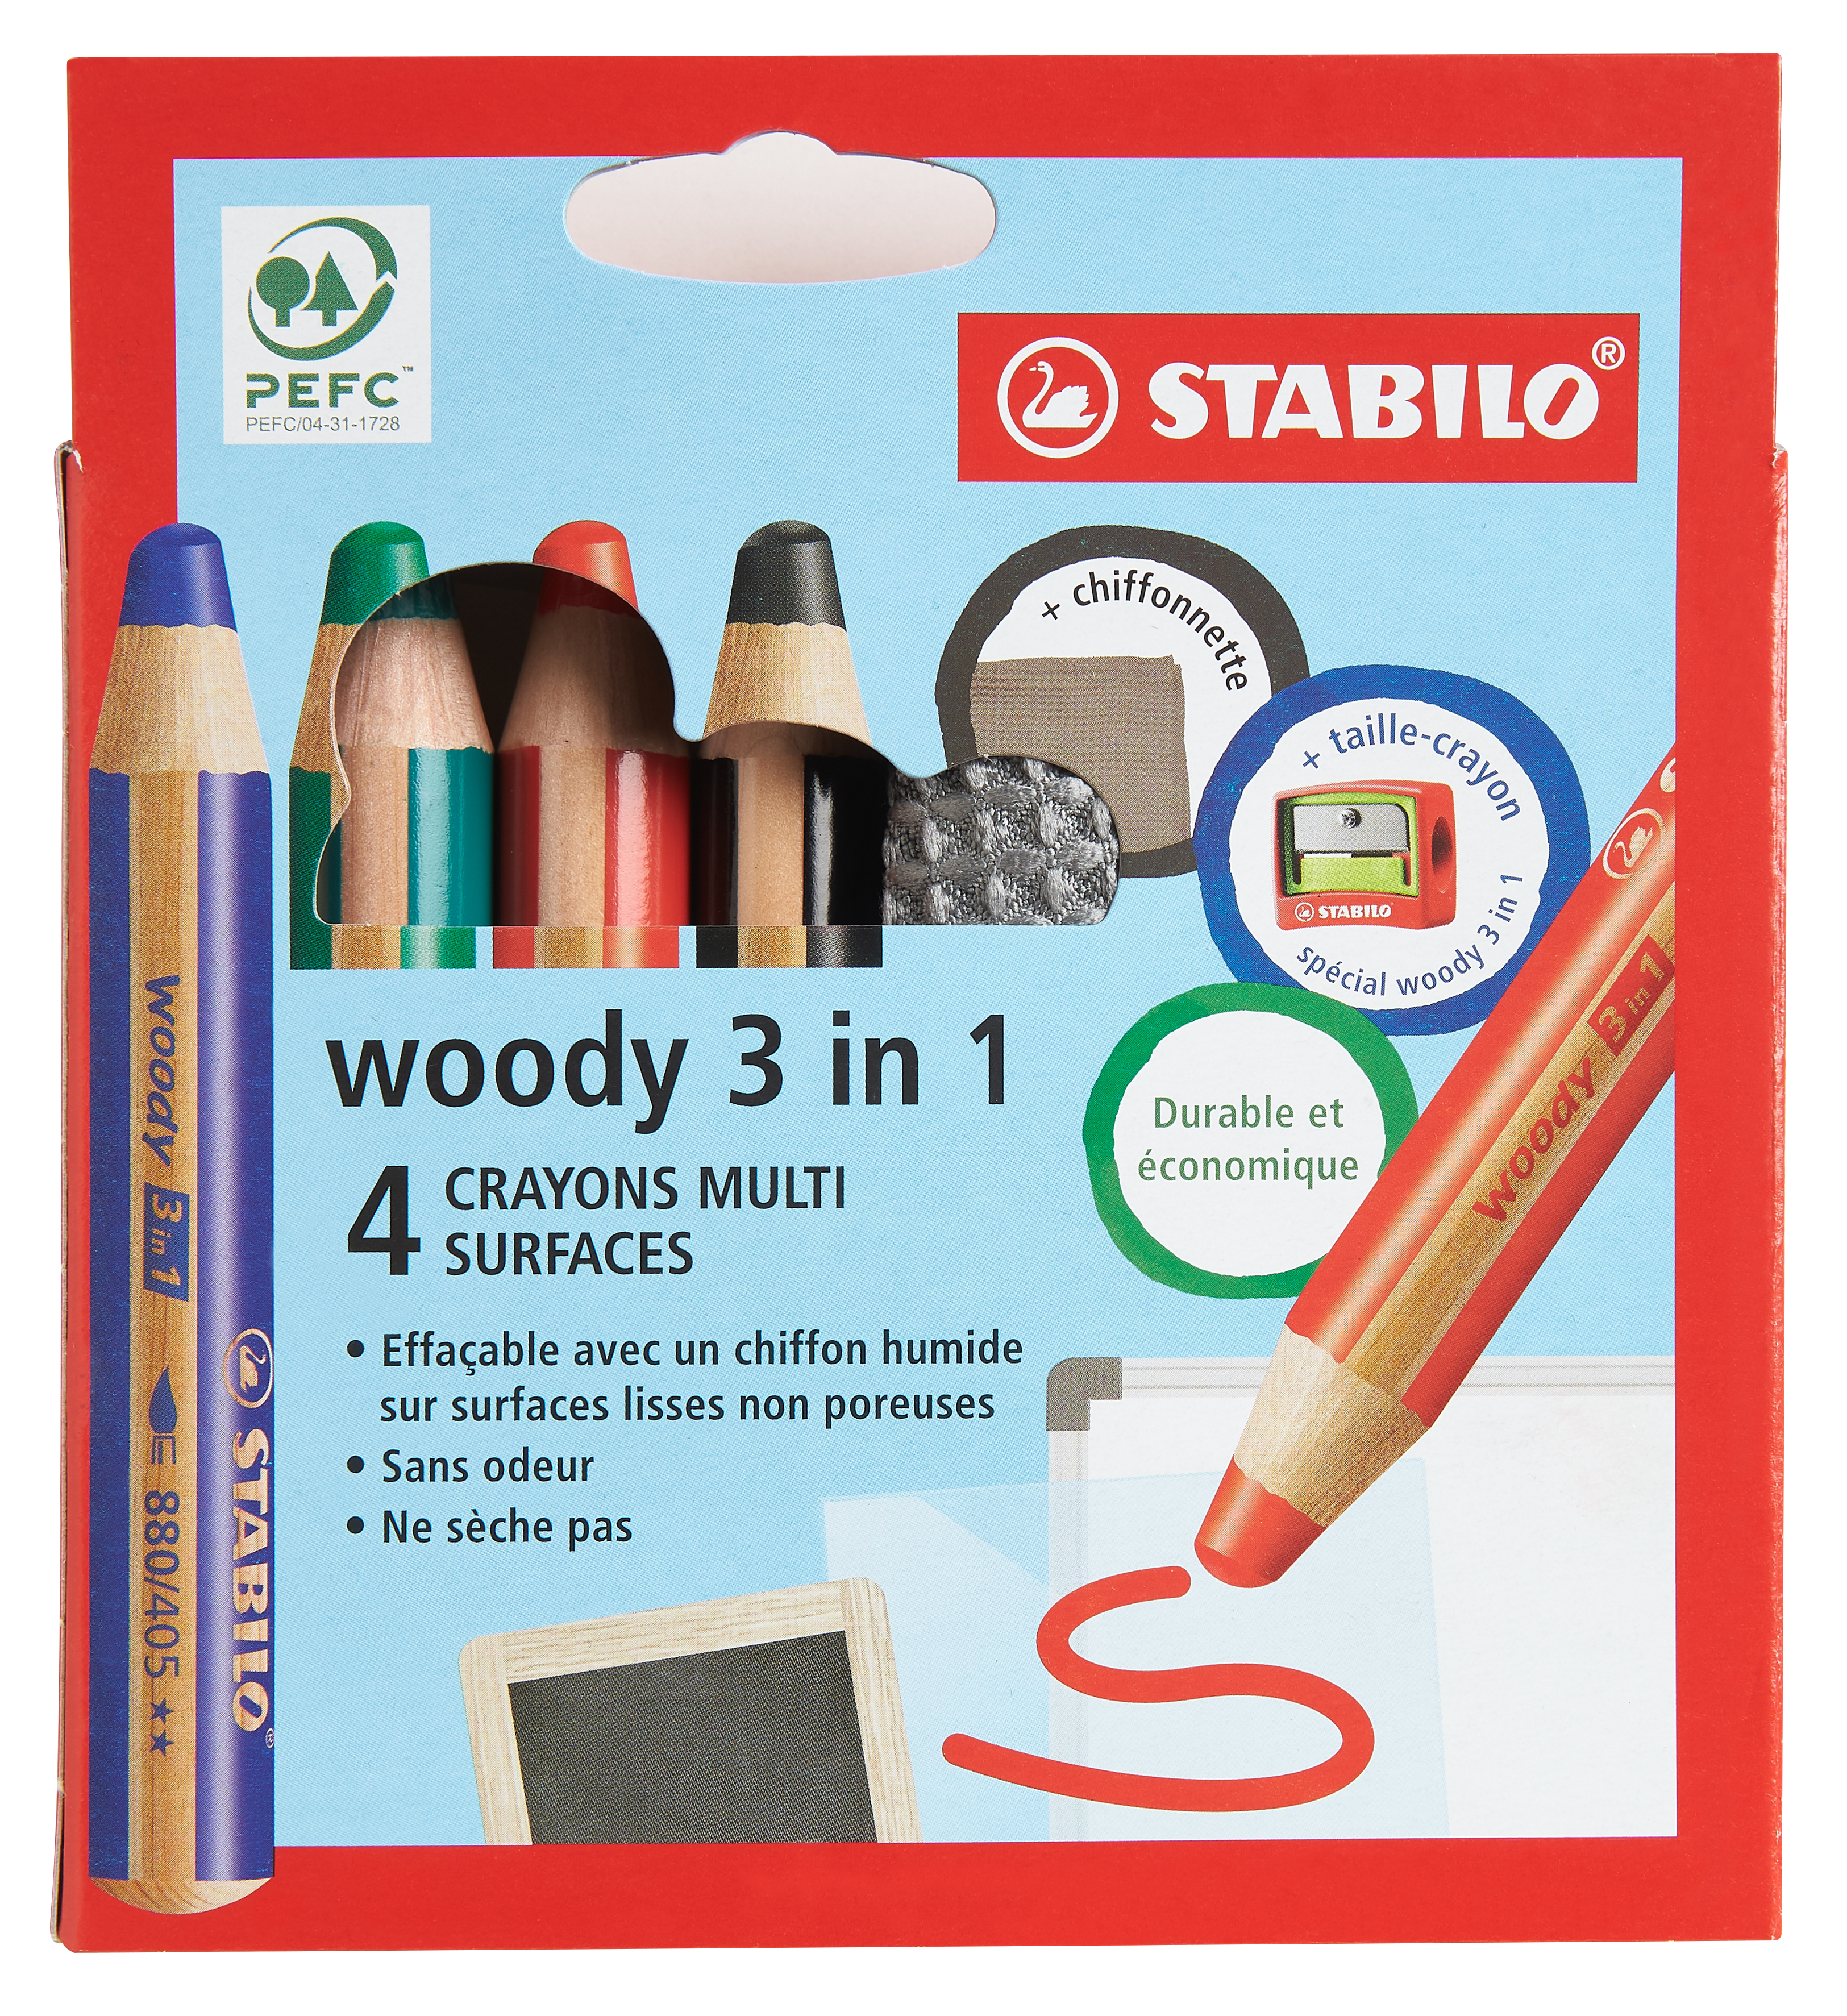 STABILO Woody 3 in 1 - Pack de 4 crayons pointe large pour ardoise - avec taille-crayon et chiffonnette - couleurs assorties